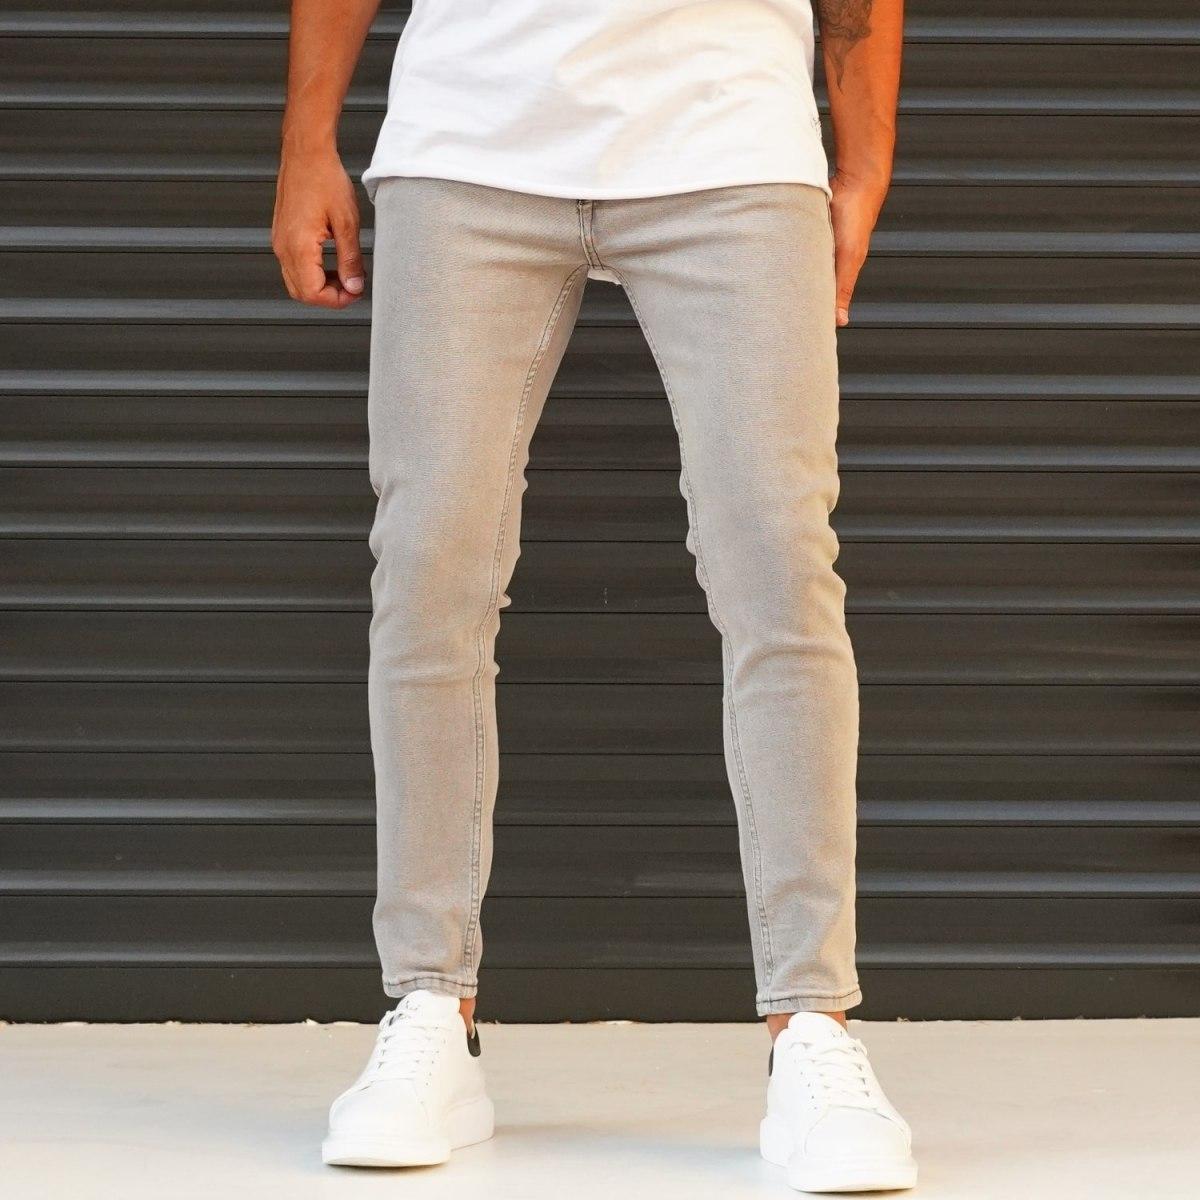 Men's  Jeans With Lycra In Beige